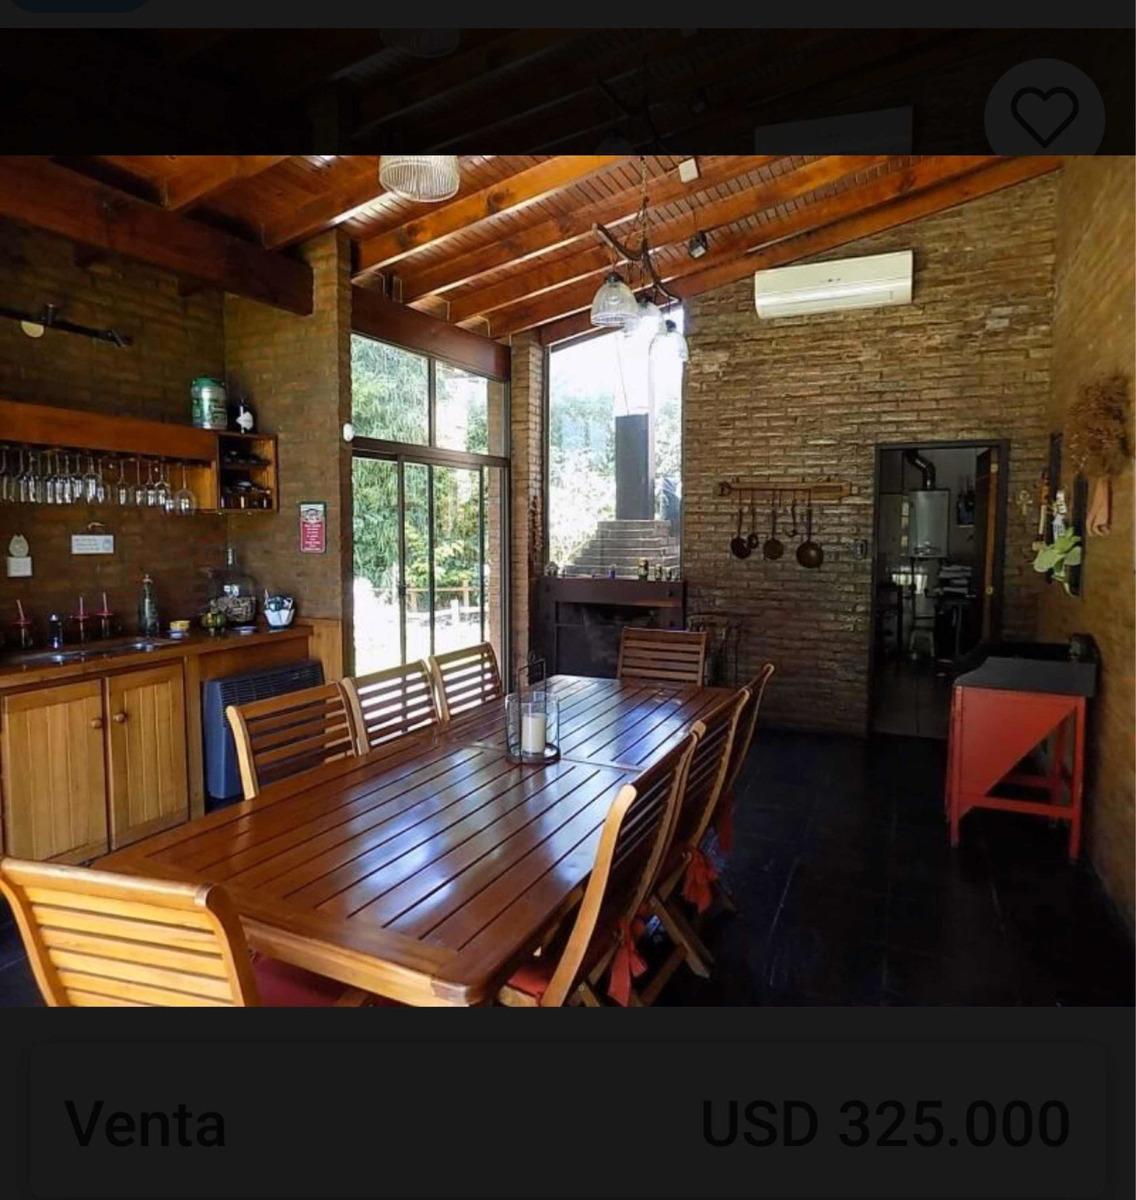 casa en venta. pilar mapuche km 49.dormitorios 4 - 2 lotes